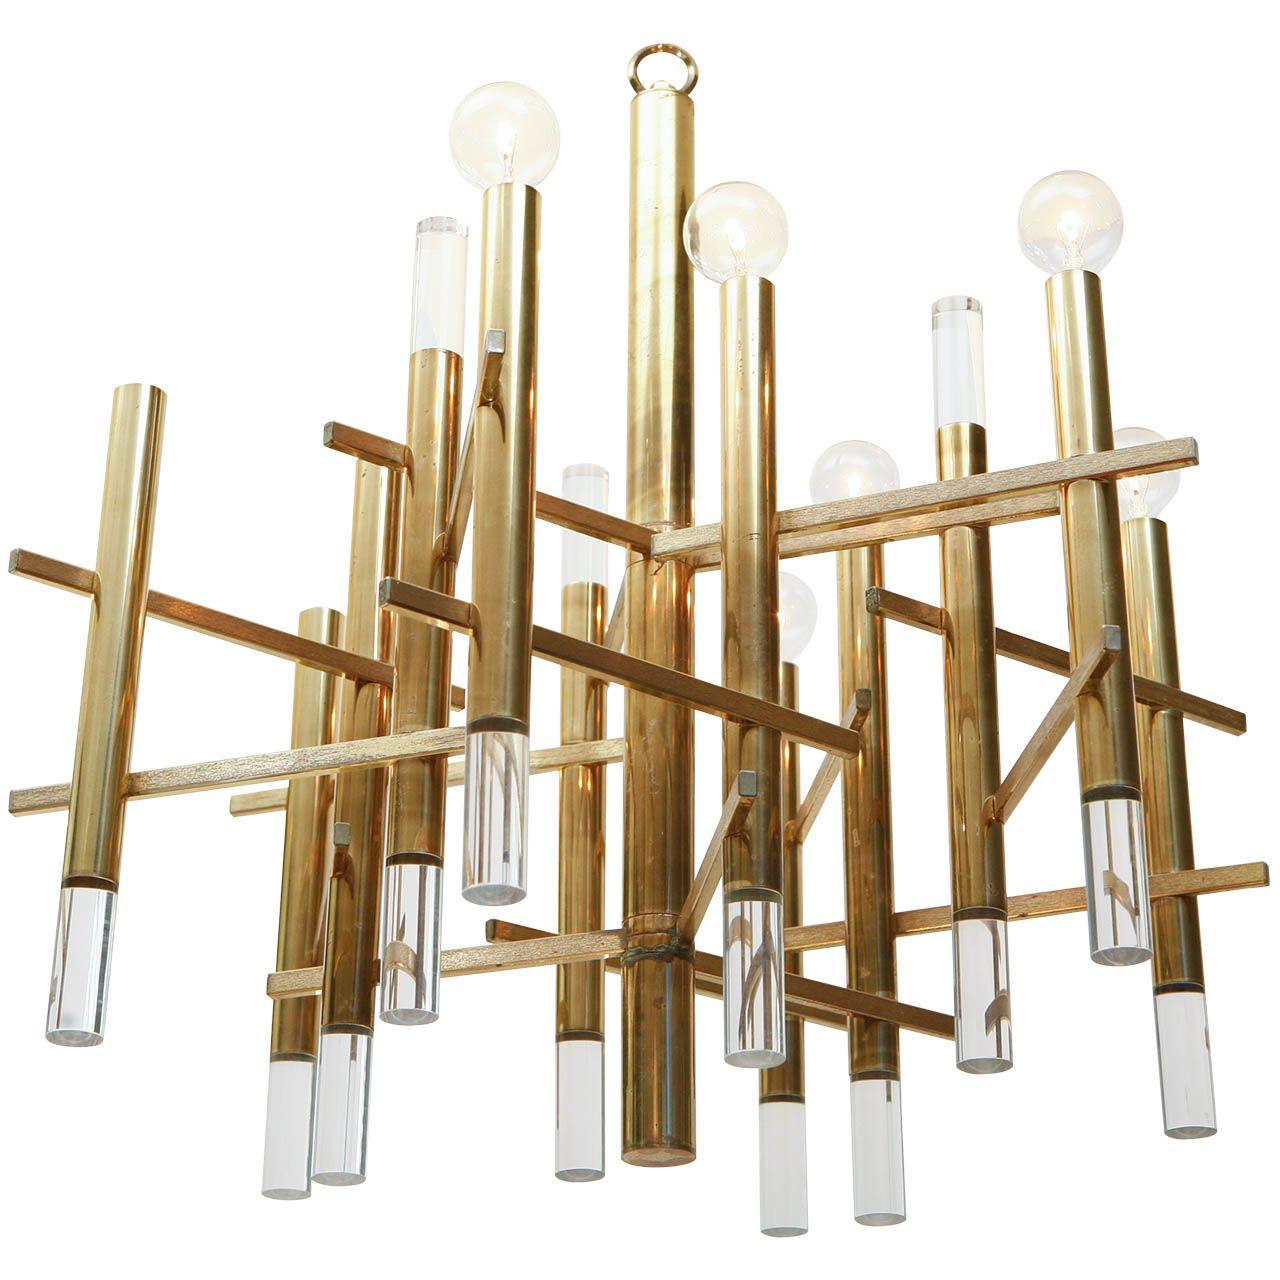 Sciolari brass and lucite chandelier pendant lighting sciolari brass and lucite chandelier aloadofball Choice Image